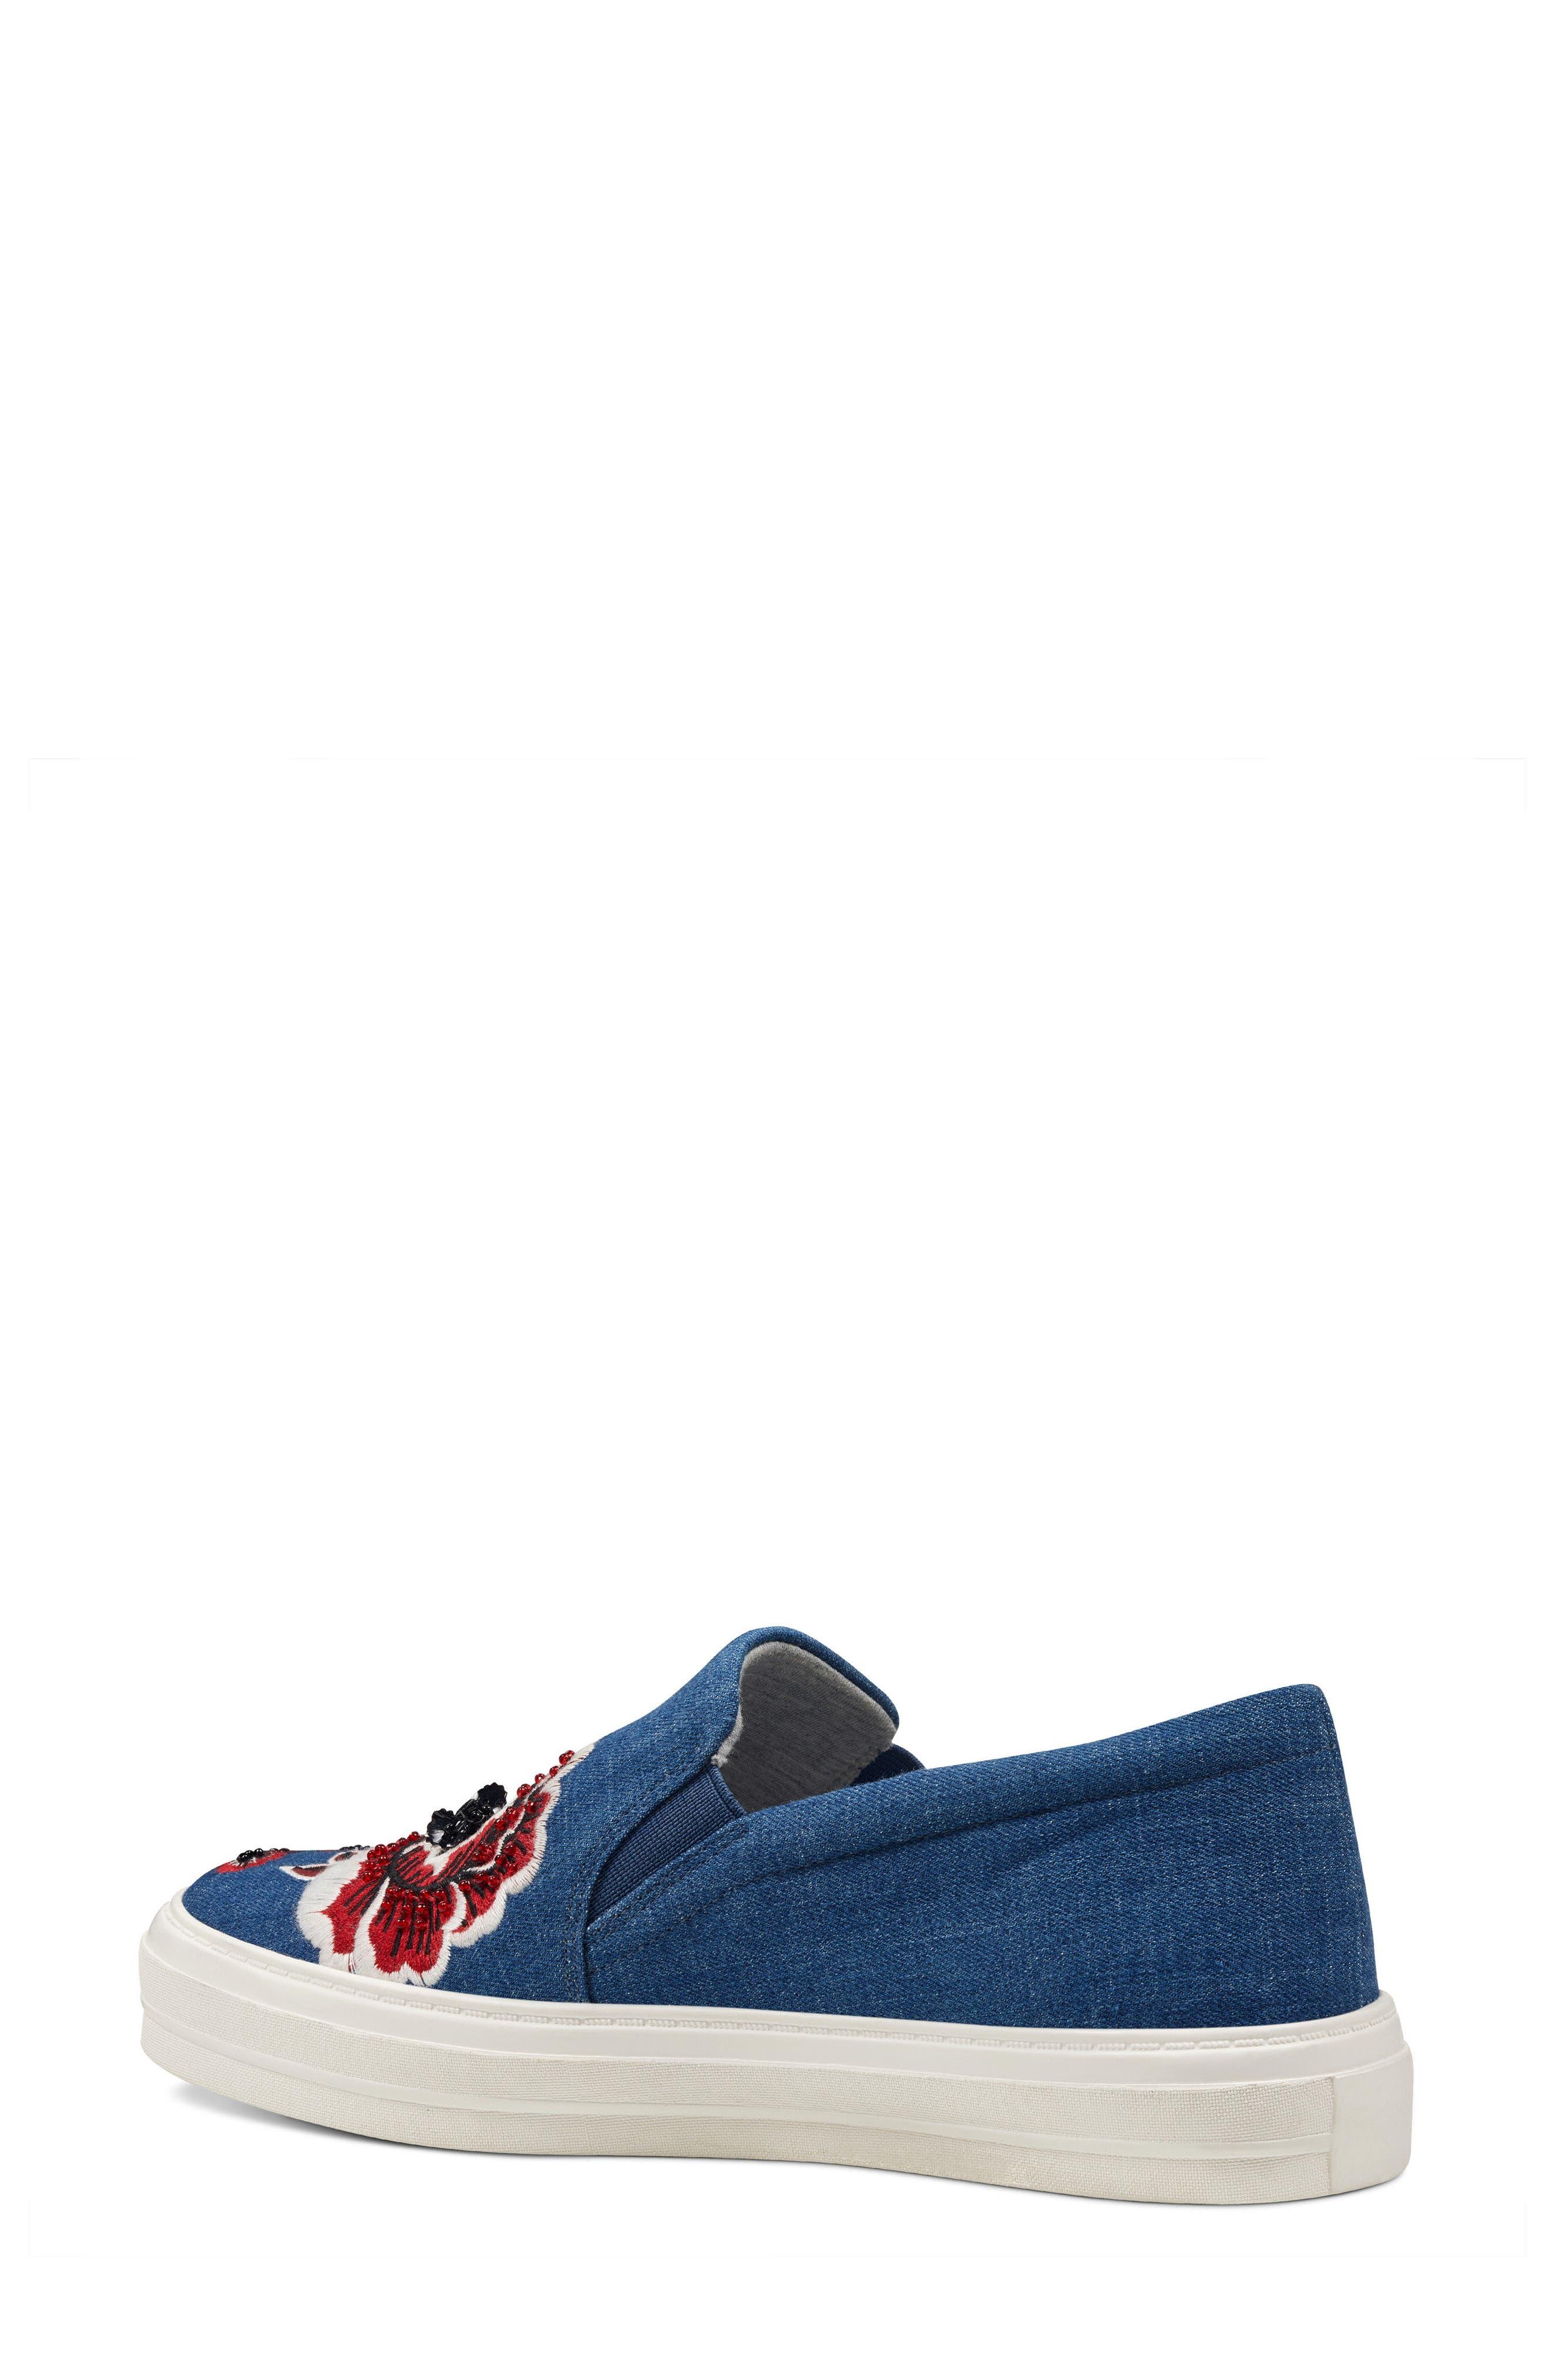 Alternate Image 2  - Nine West Onyeka Embroidered Slip-On Sneaker (Women)